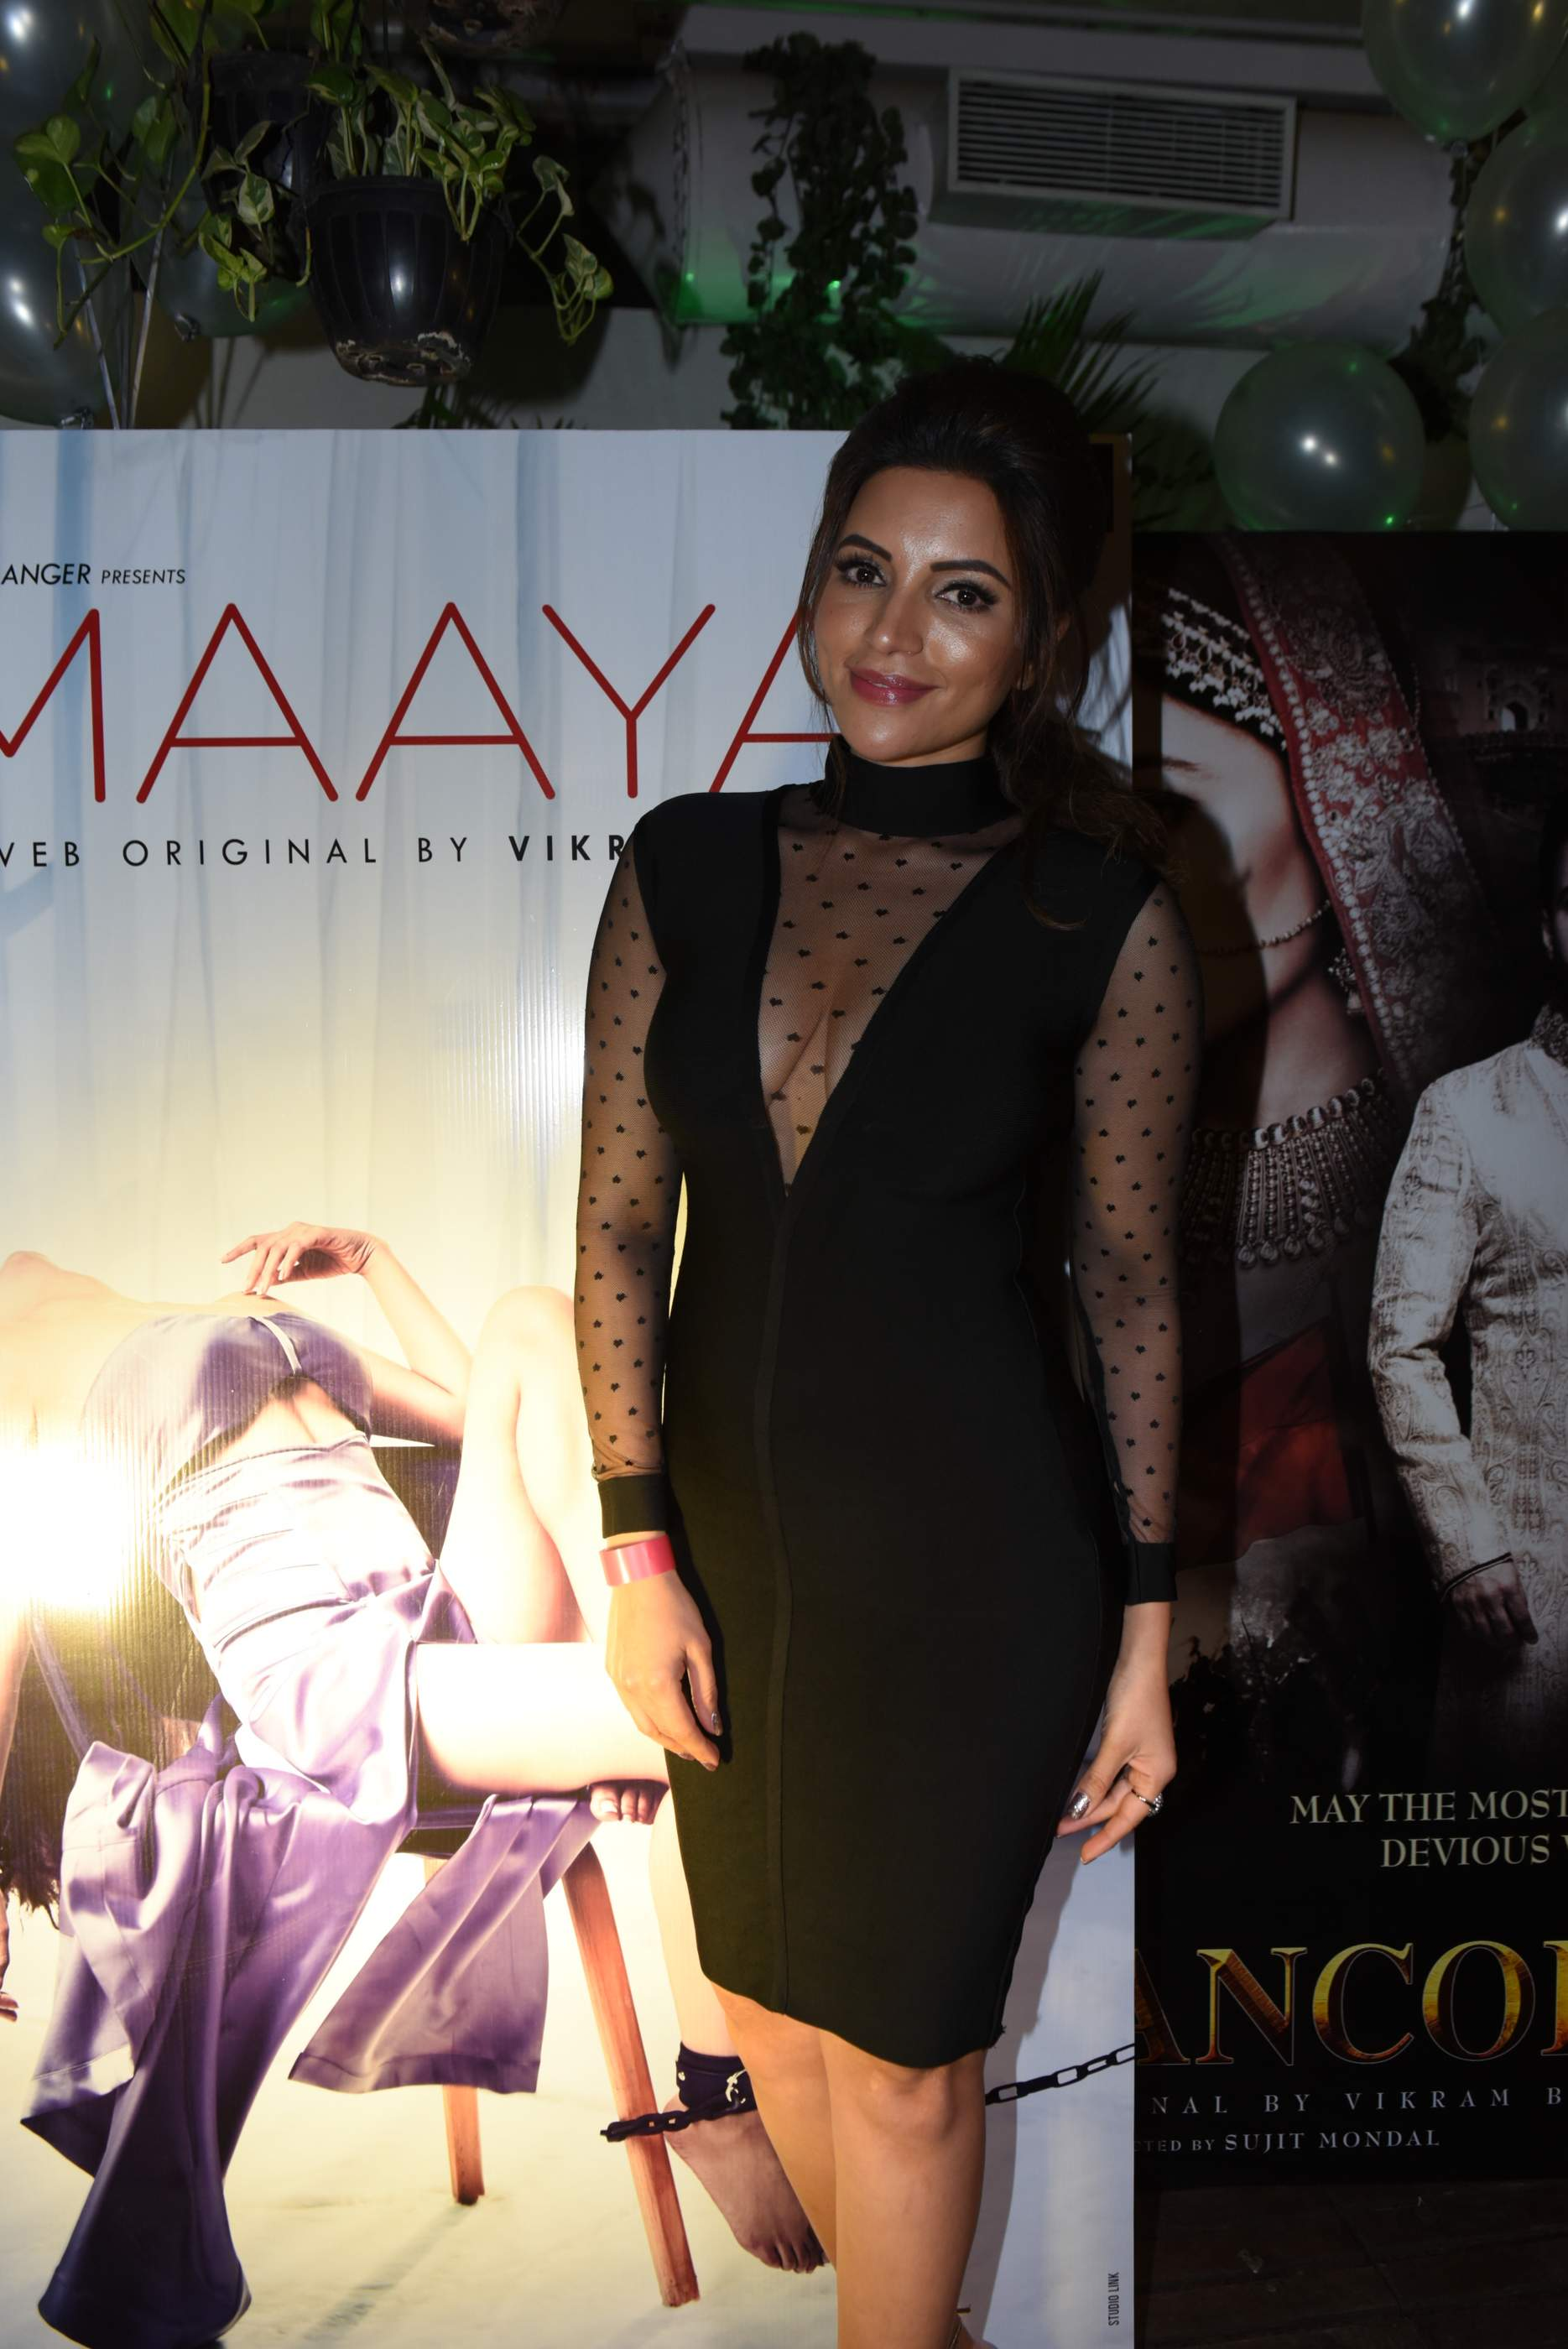 Vikram Bhatt's Adult Web Series | Maaya | Sexy Actresses